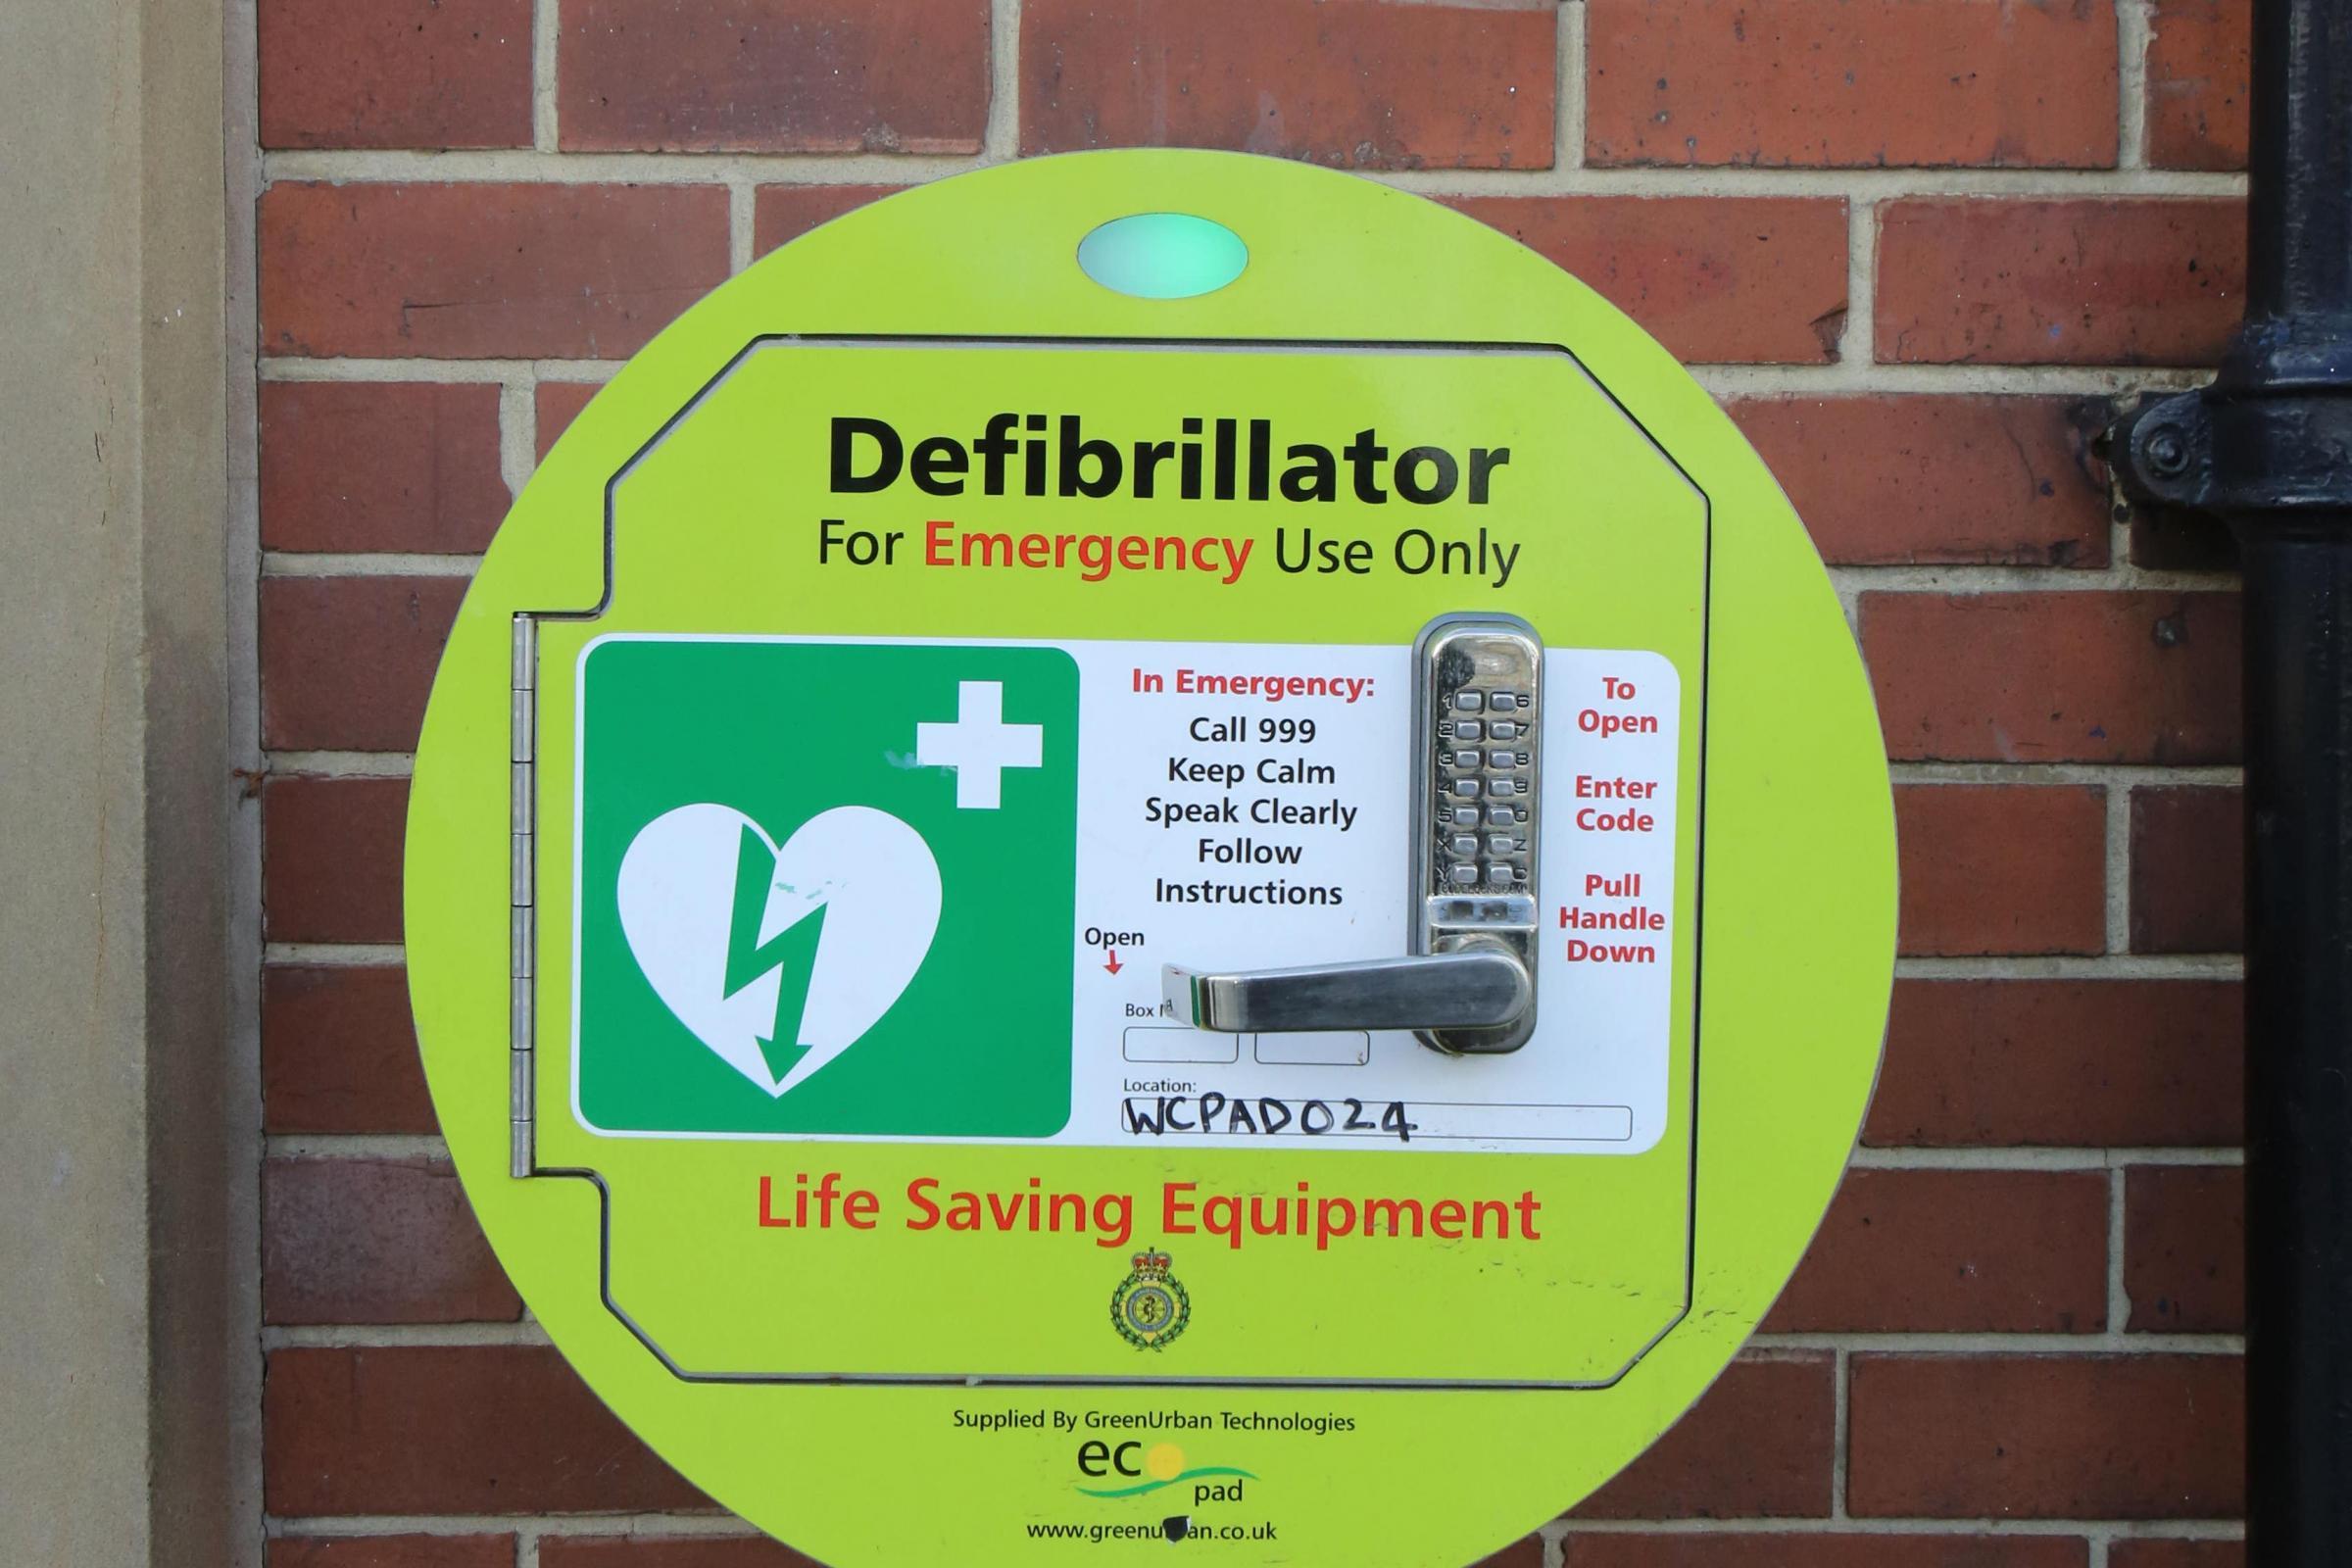 Sussex football club appeals online after vandals smash defibrillator kit